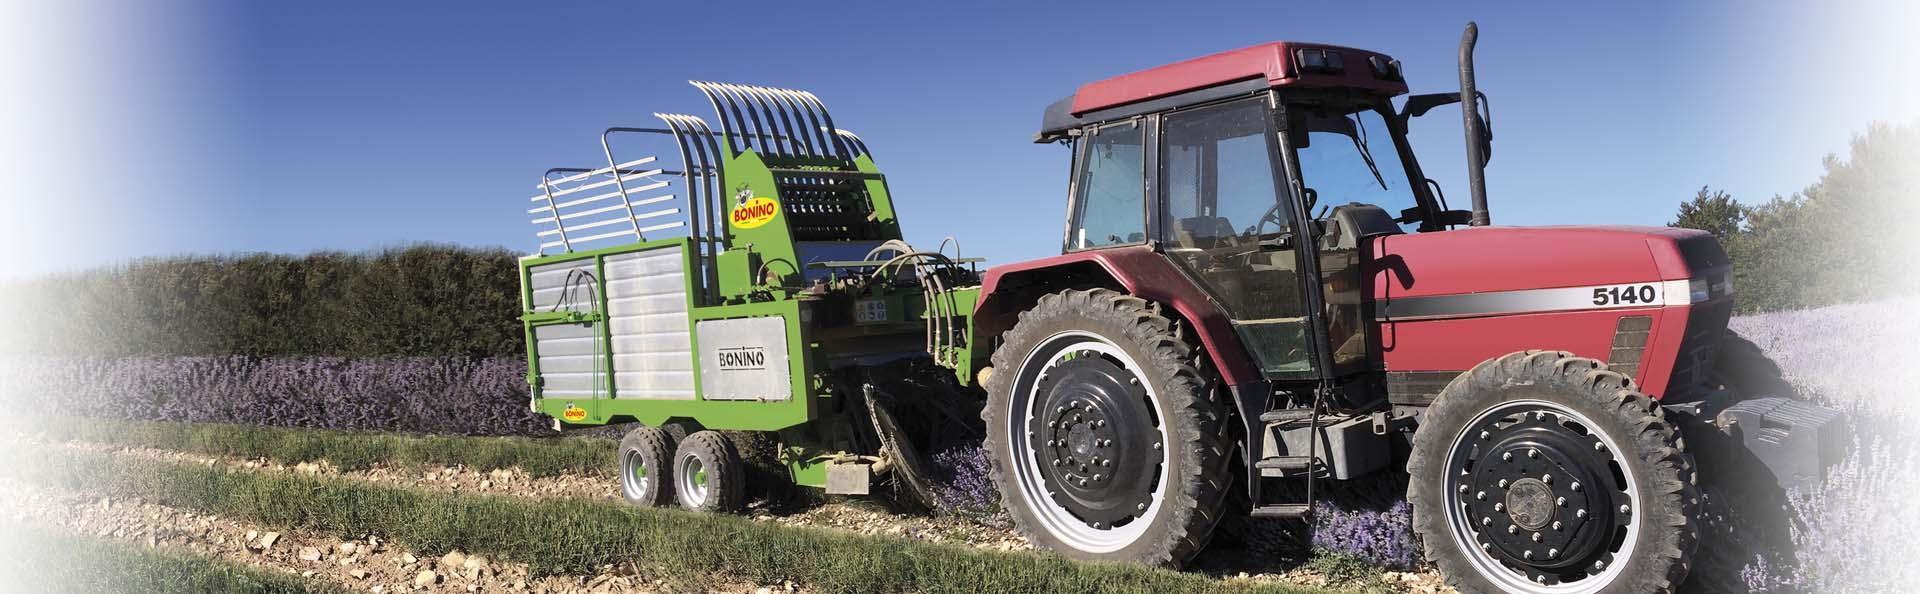 Bonino-macchina-raccolta-lavanda-alavoro-machine-harvesting-lavandula-dentata-machine-récolte-lavande-en-action